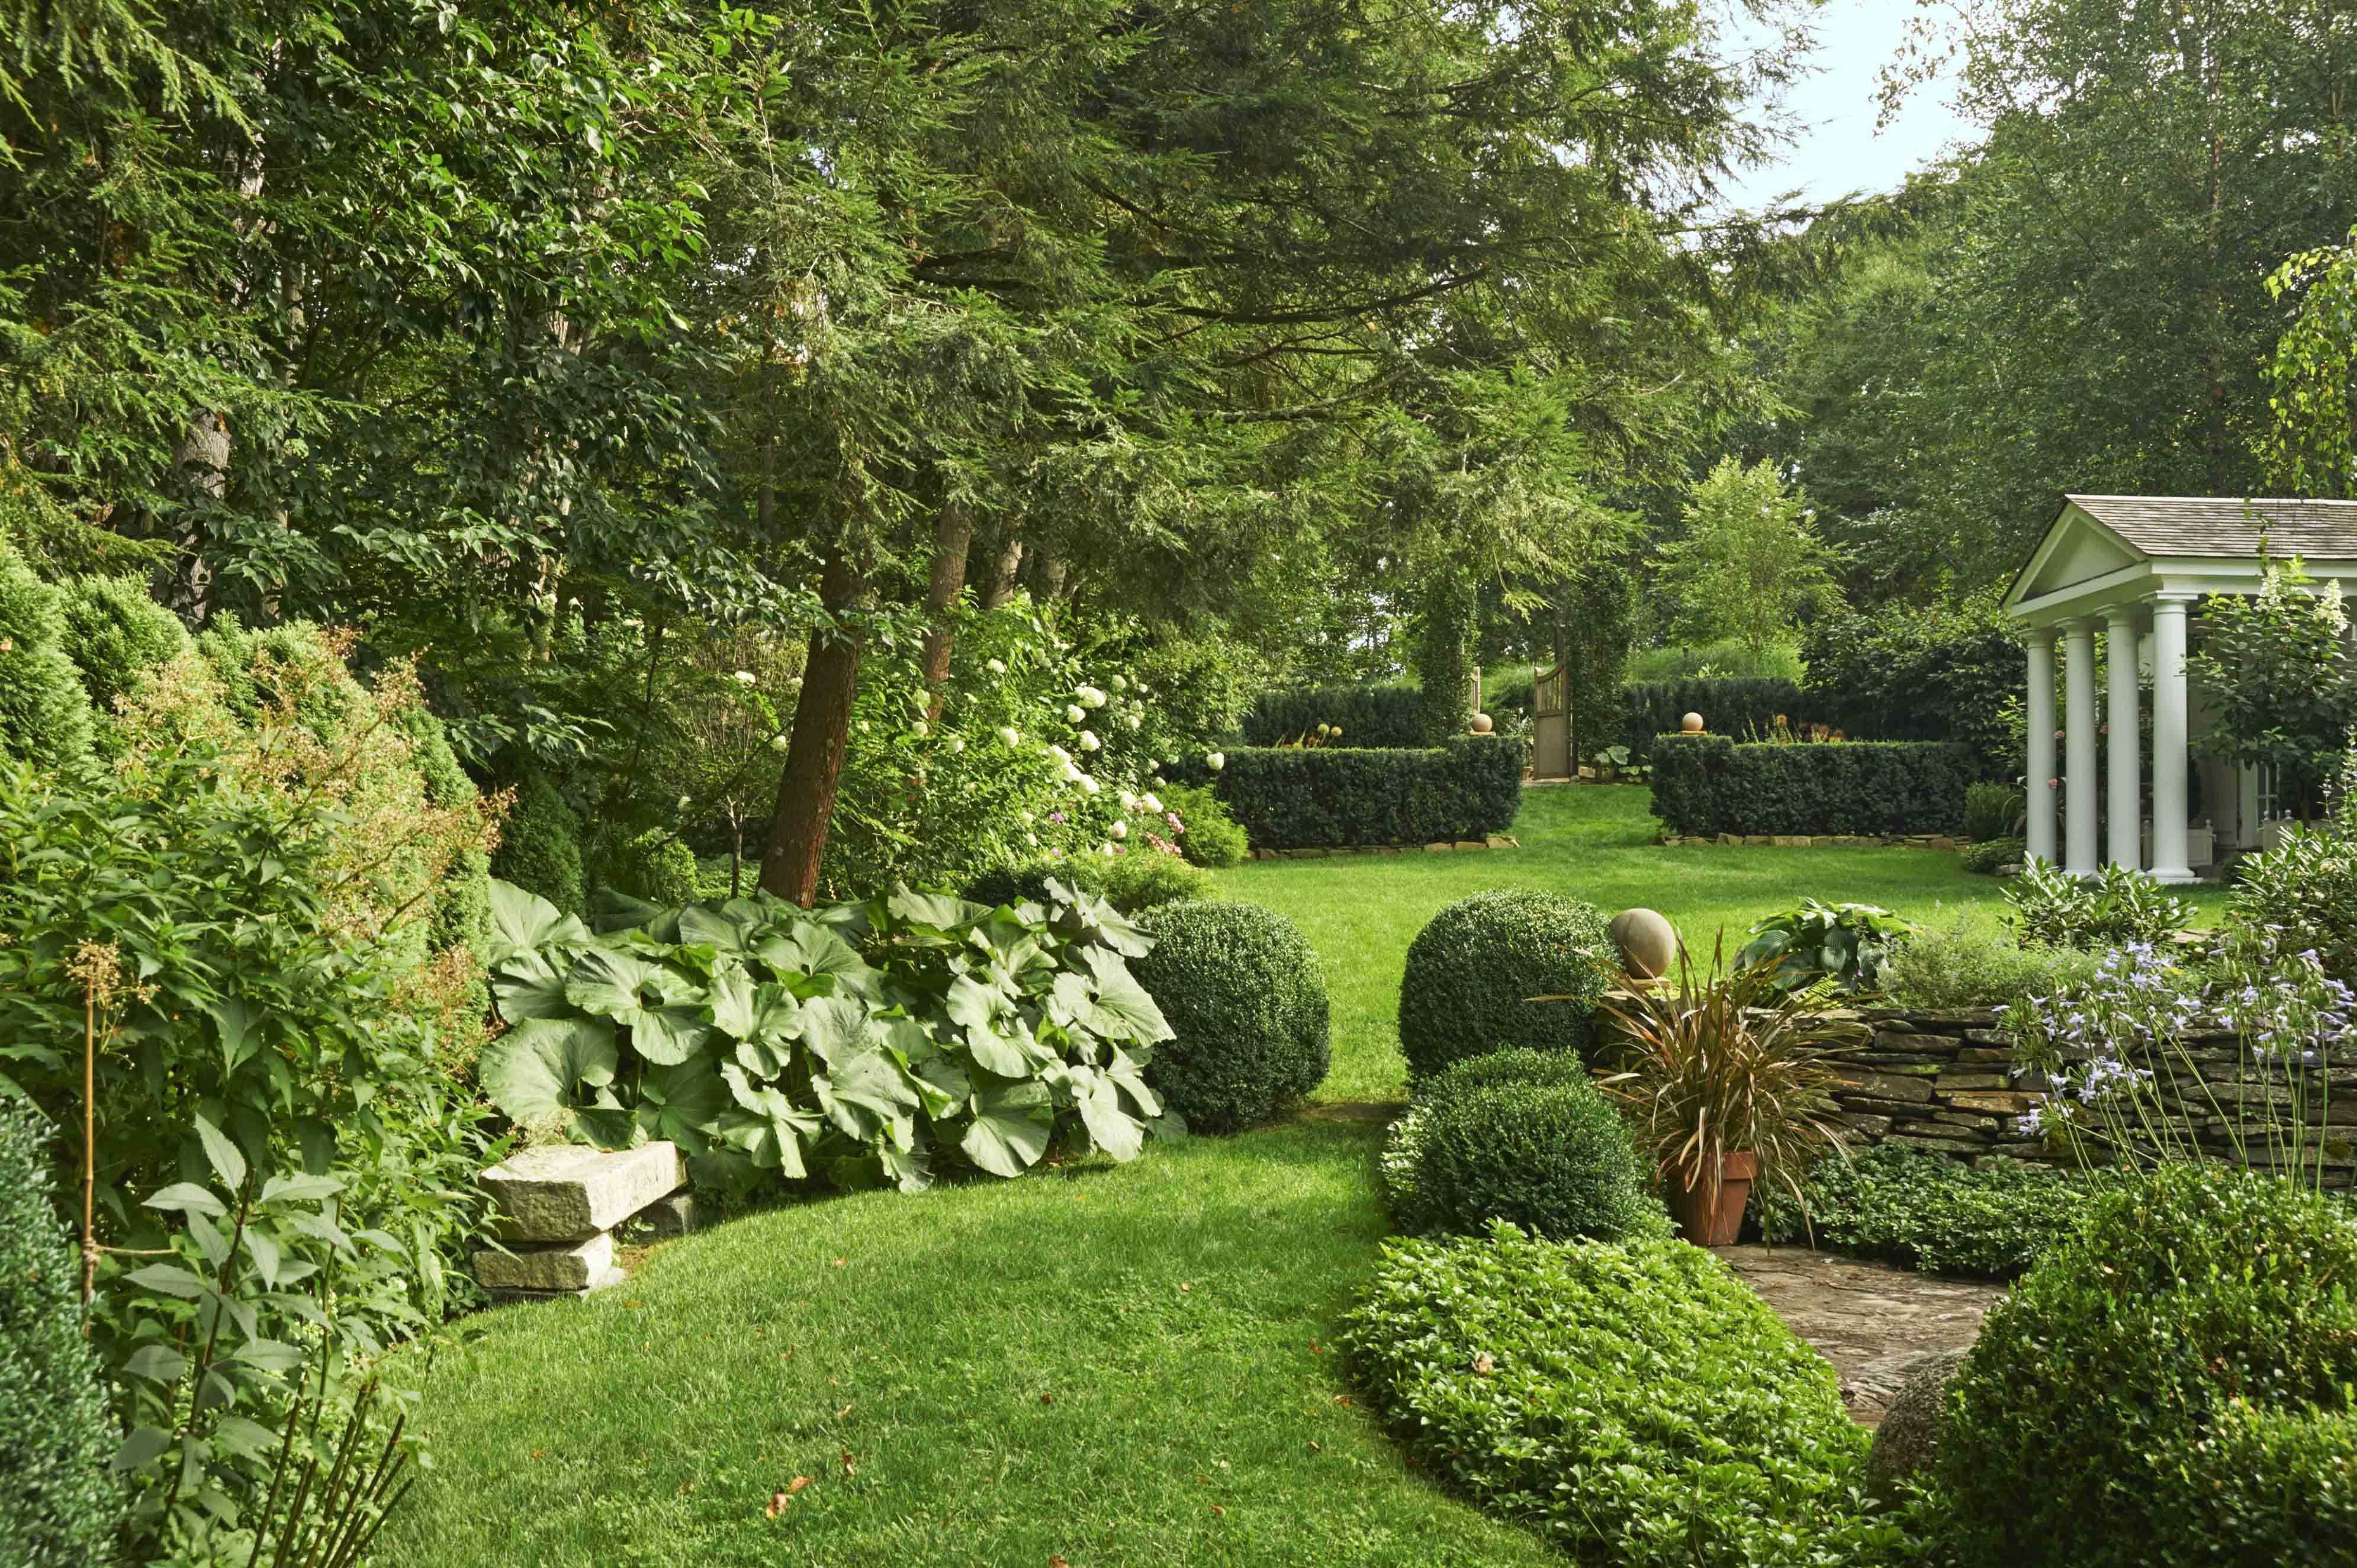 Best Landscaping Ideas 2021 Landscape Designs For Front Yards